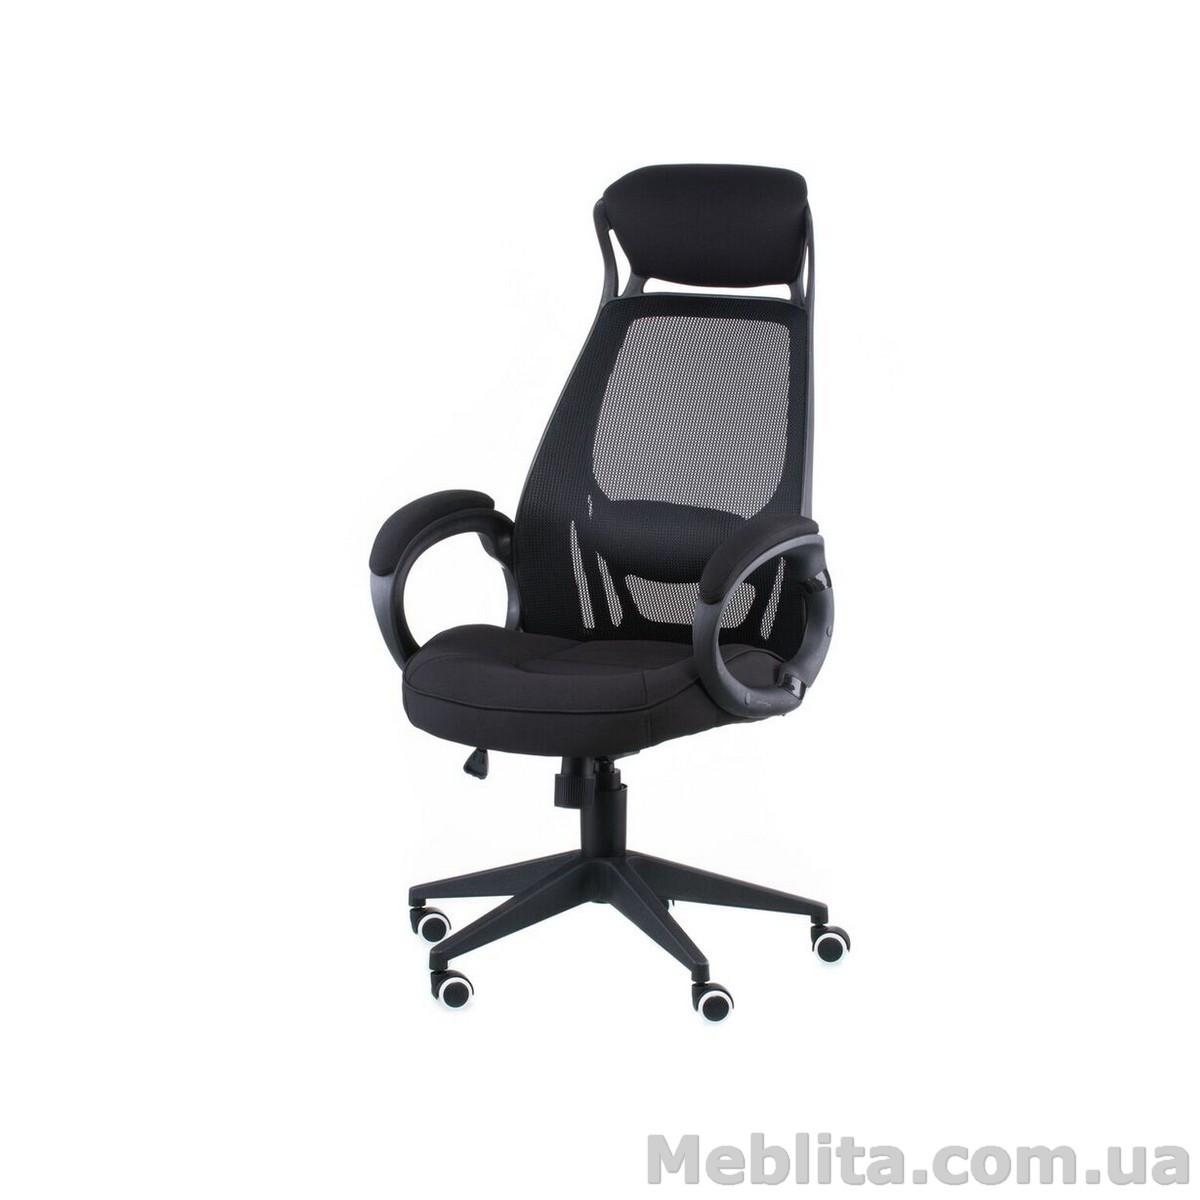 Кресло офисное Briz black fabric Special4You